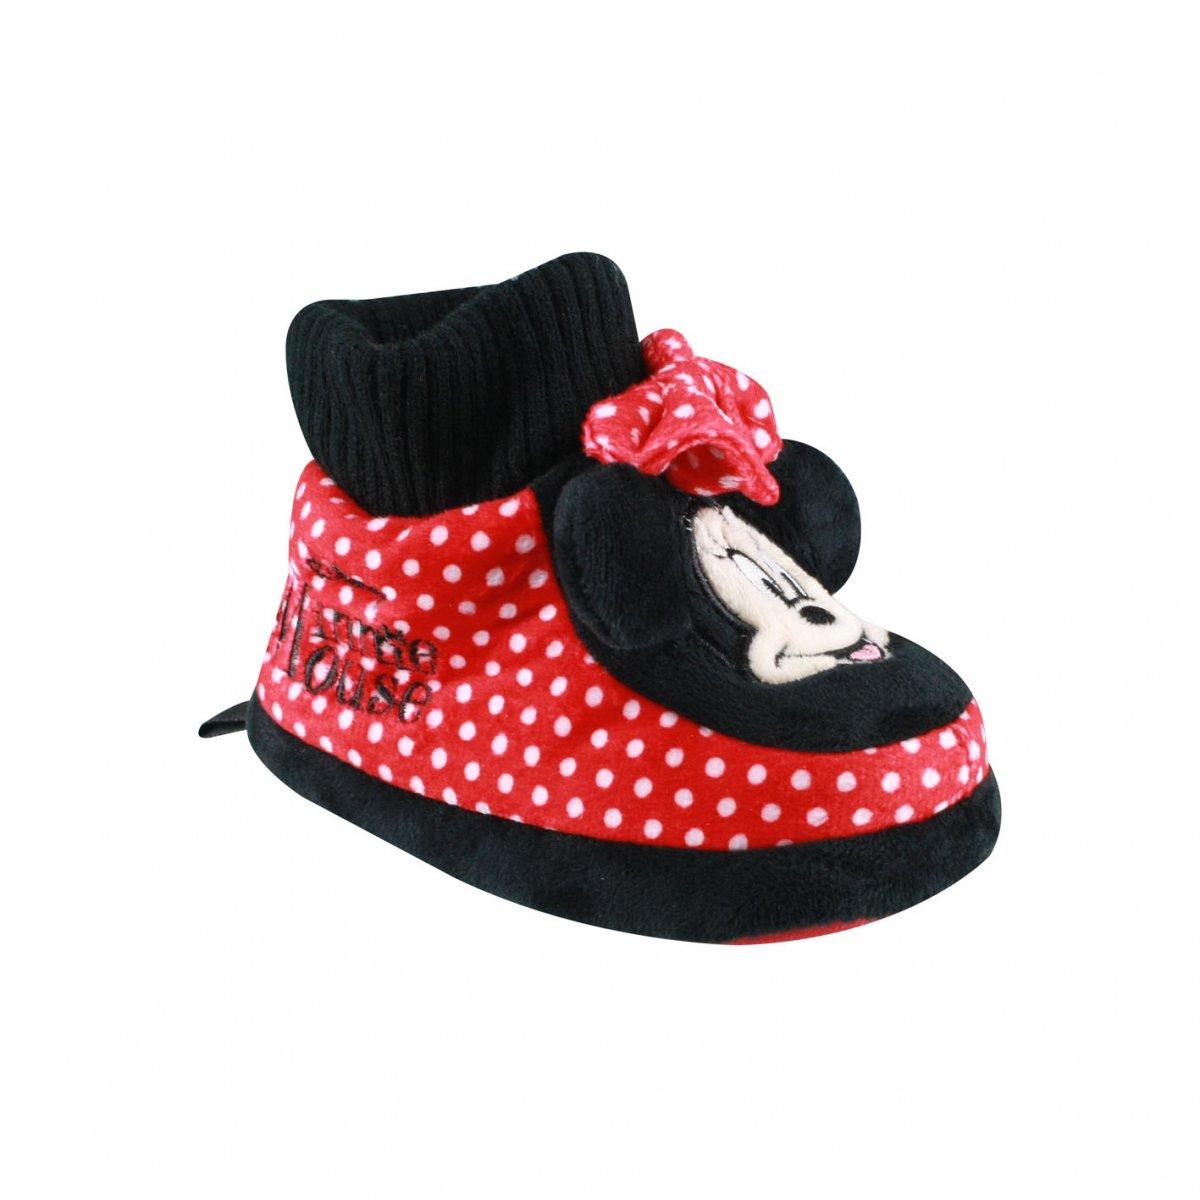 9858900f7 Pantufa Infantil Ricsen Flat Minnie Mouse. Passe o mouse na imagem para  ampliar Ampliar imagem